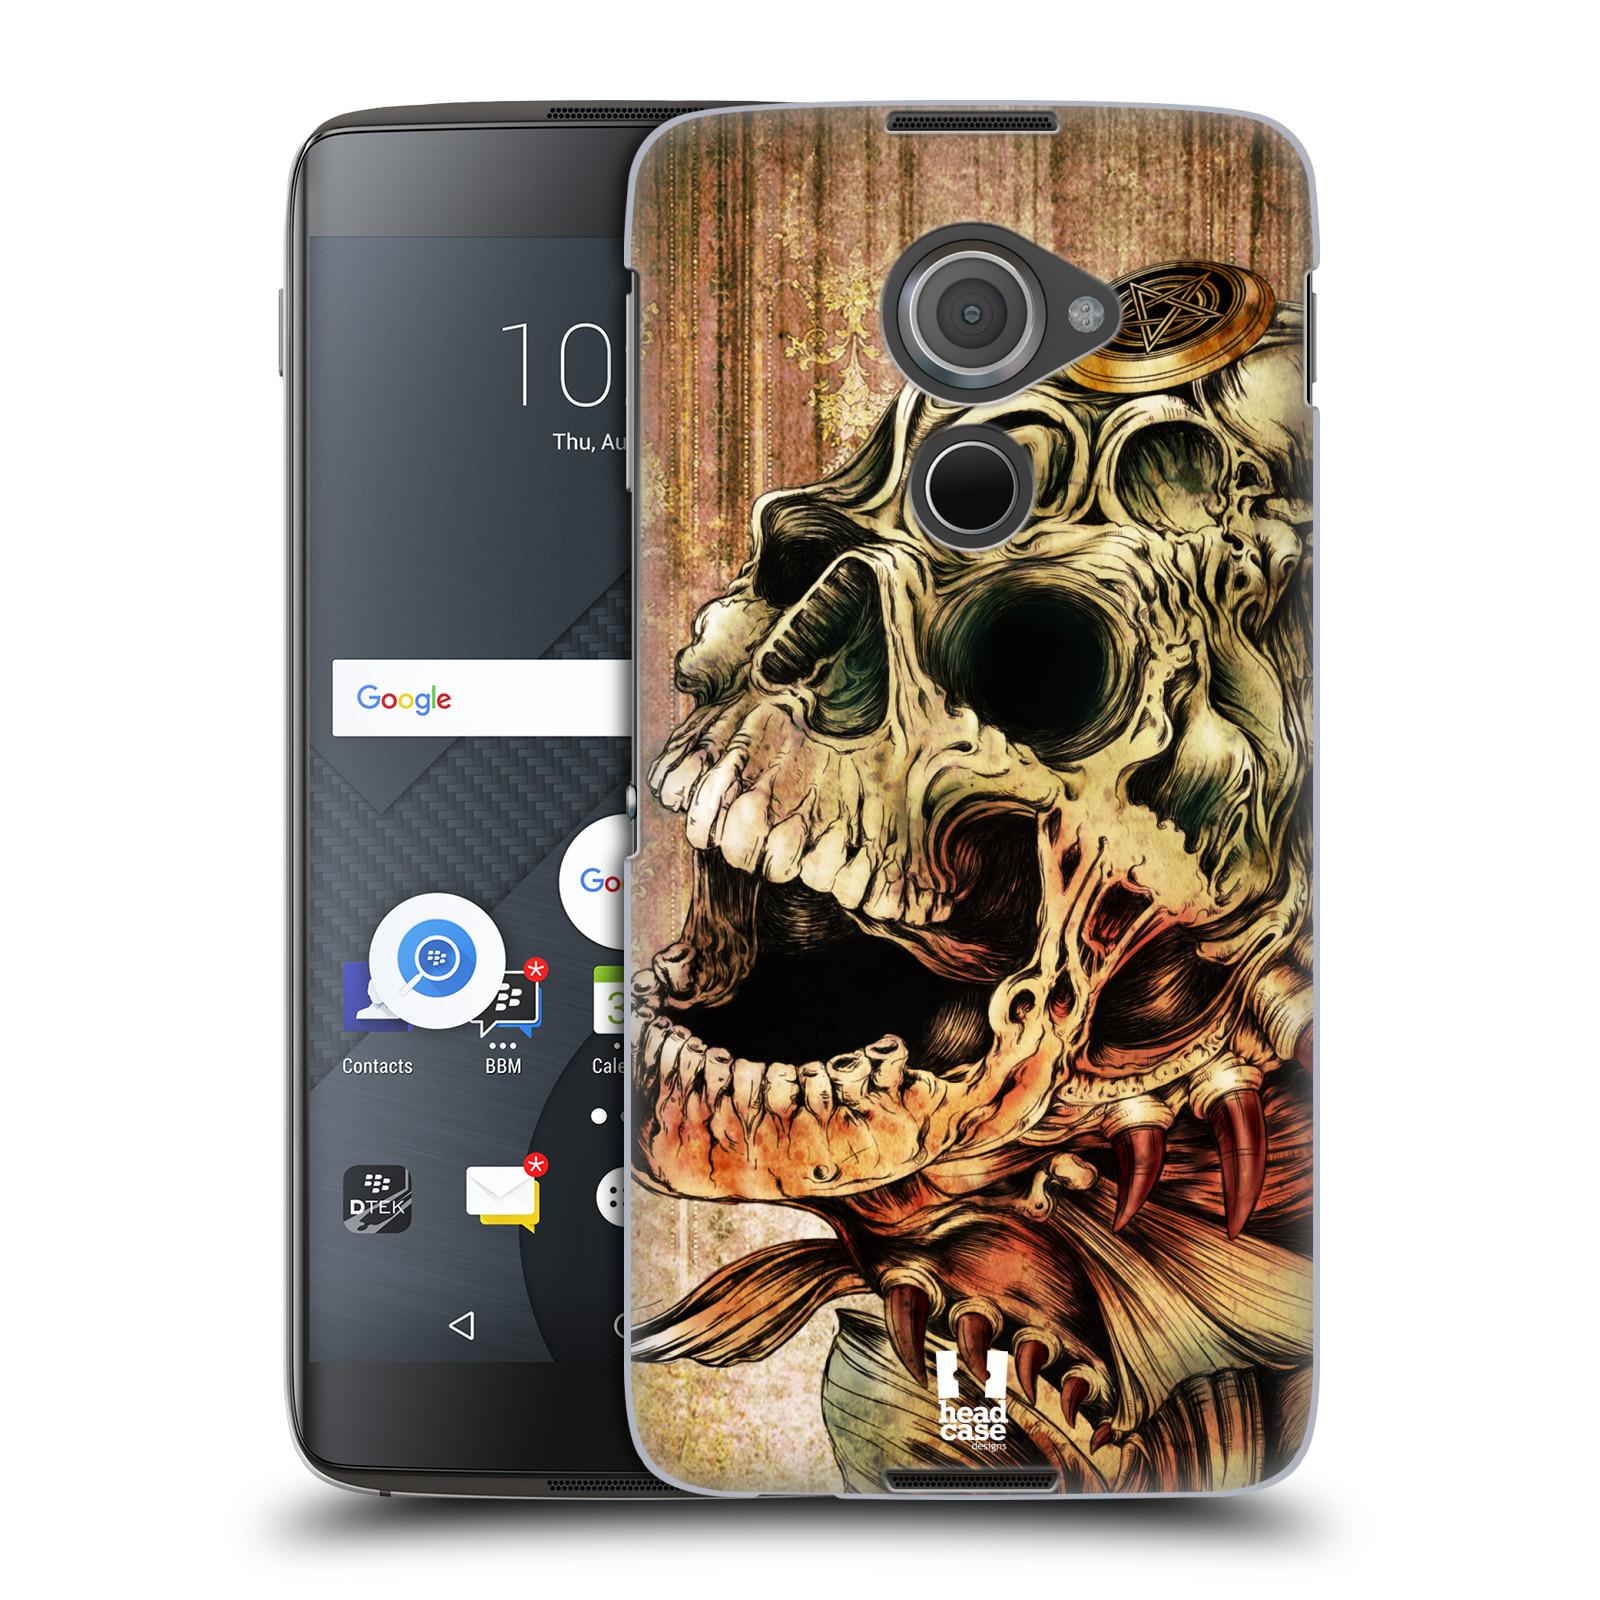 Plastové pouzdro na mobil Blackberry DTEK60 (Argon) - Head Case PIRANHA (Plastový kryt či obal na mobilní telefon Blackberry DTEK60 (Argon))